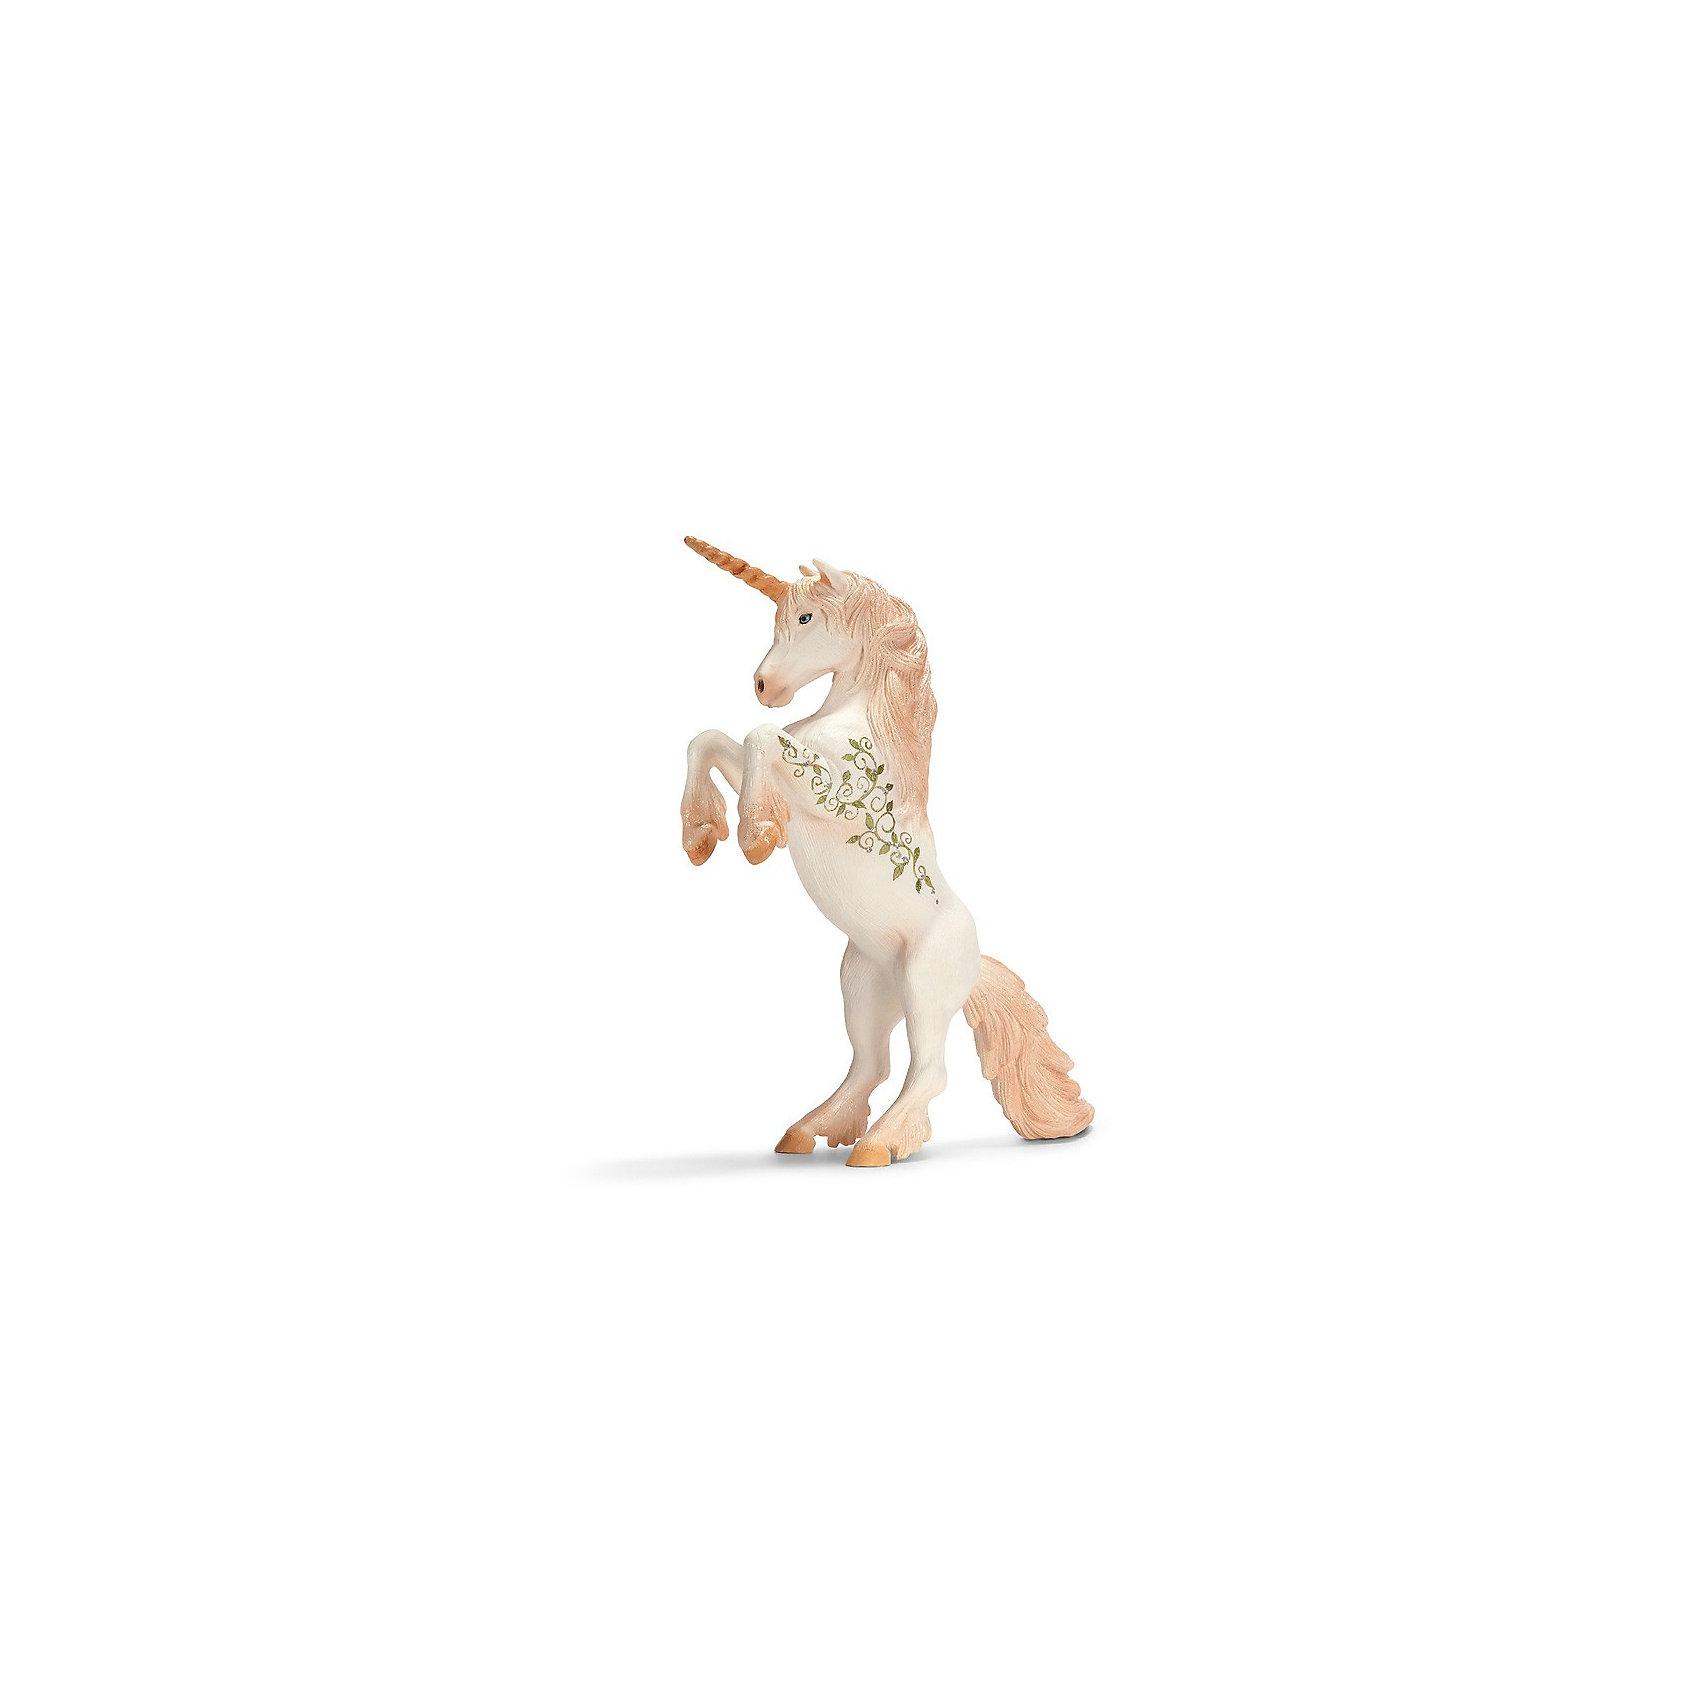 Schleich Schleich Единорог, вставший на дыбы. Серия Эльфы игровые наборы schleich повозка для эльфов